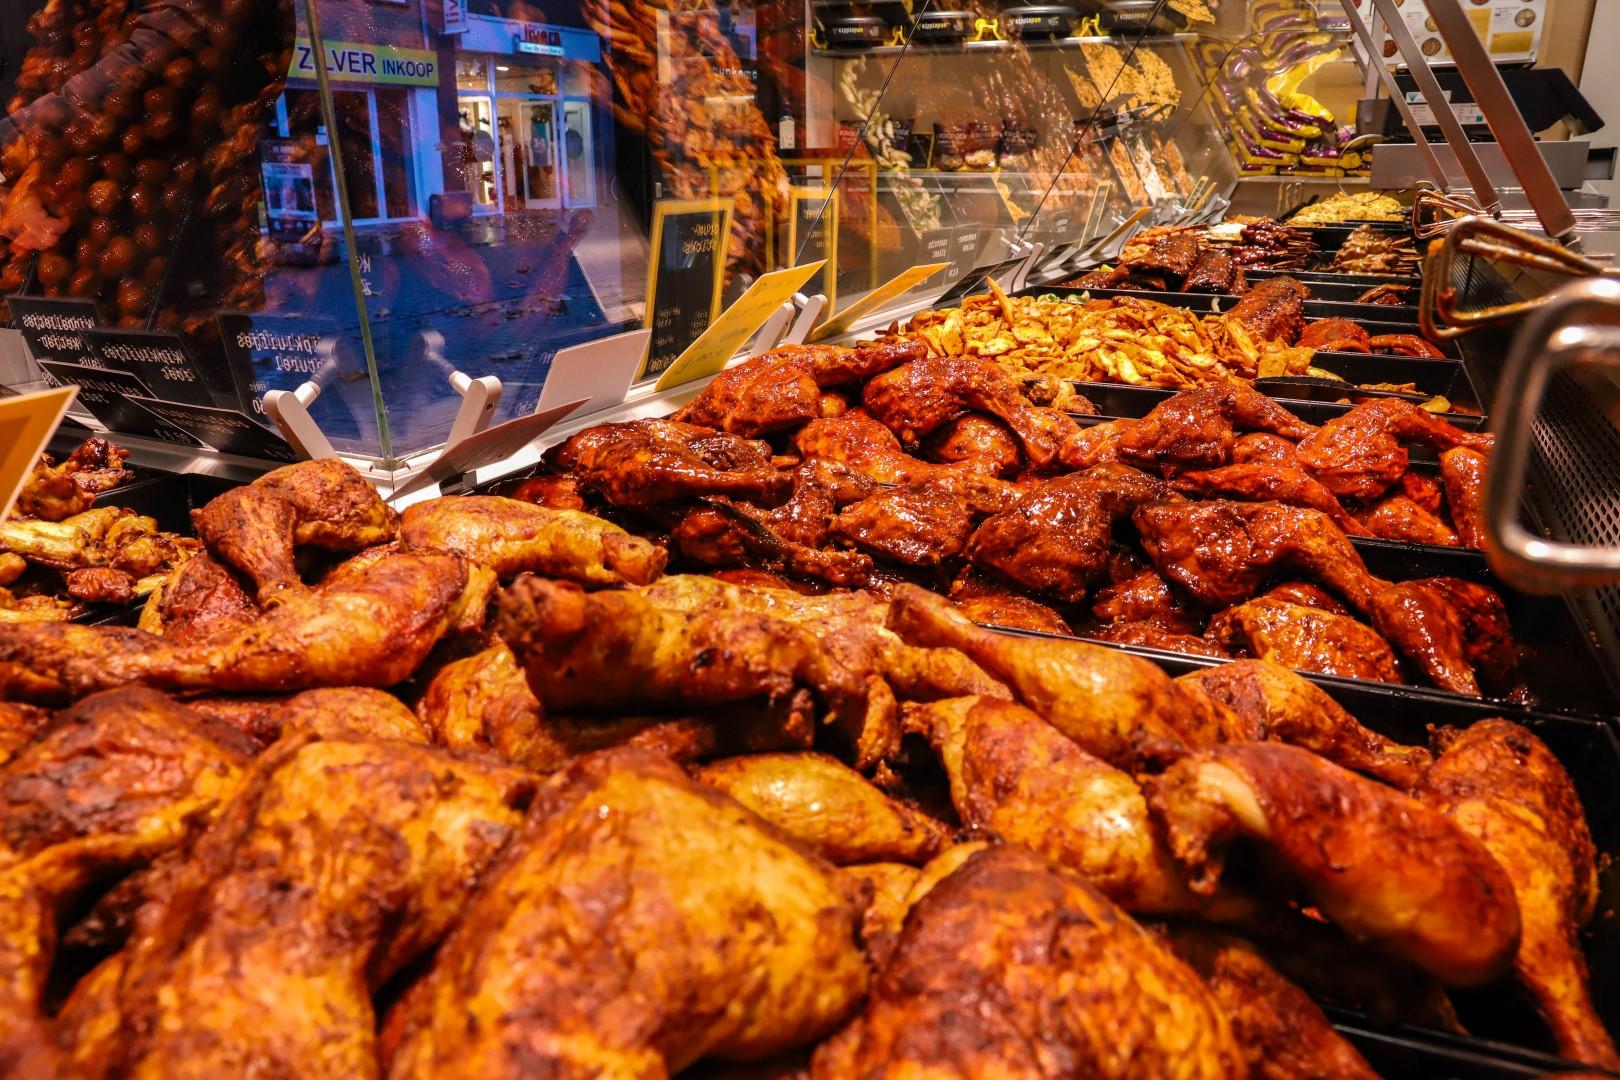 kippie maaltijden grill kip